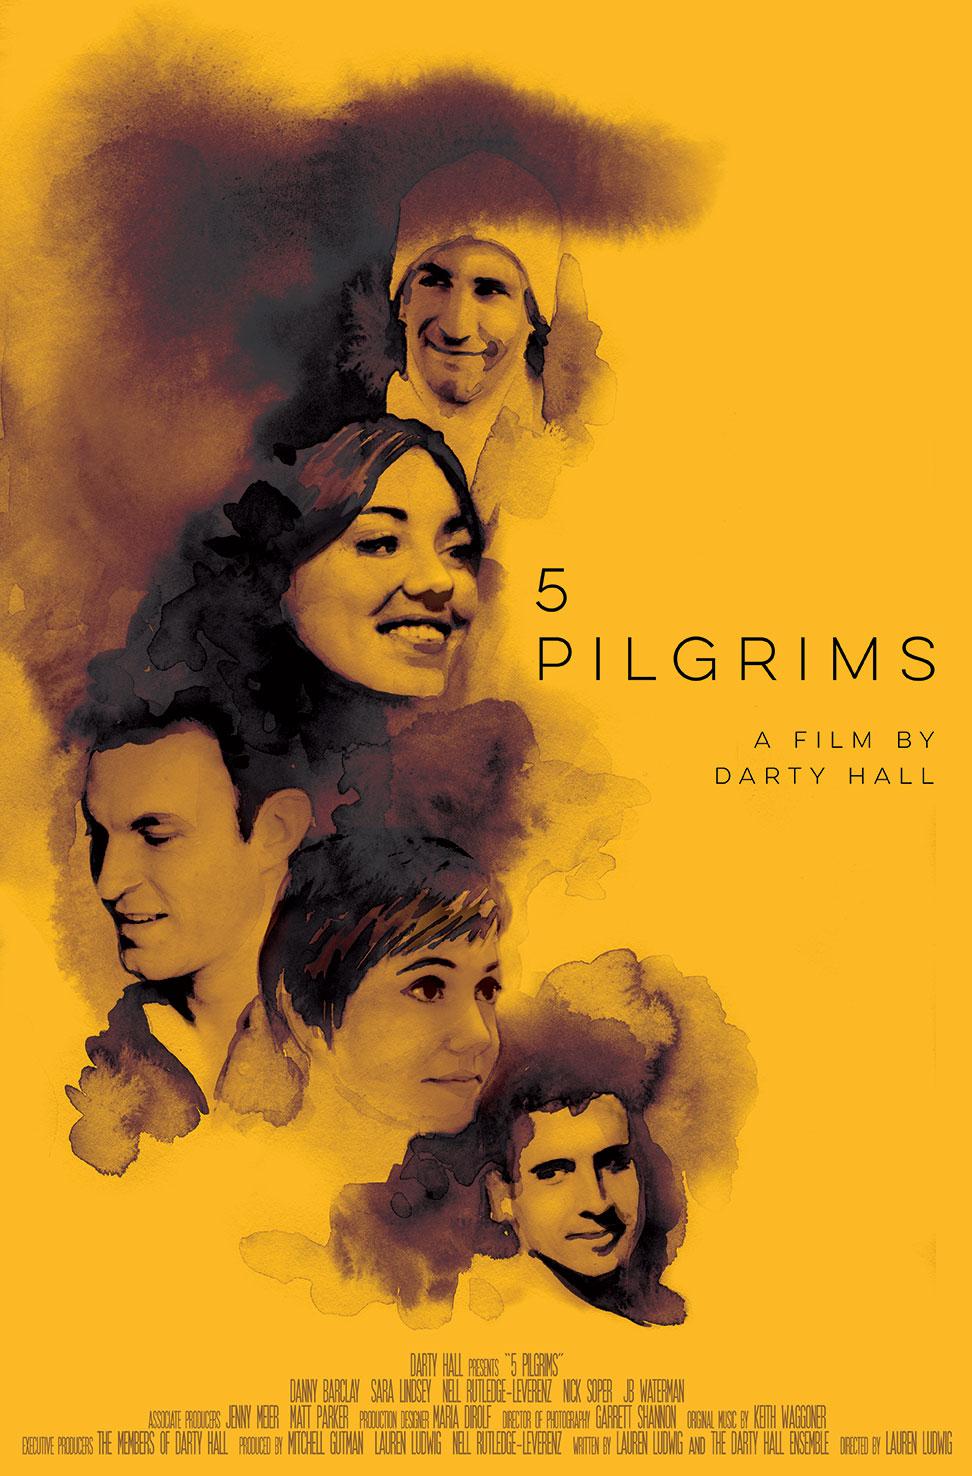 5 Pilgrims Movie Poster Illustration And Design